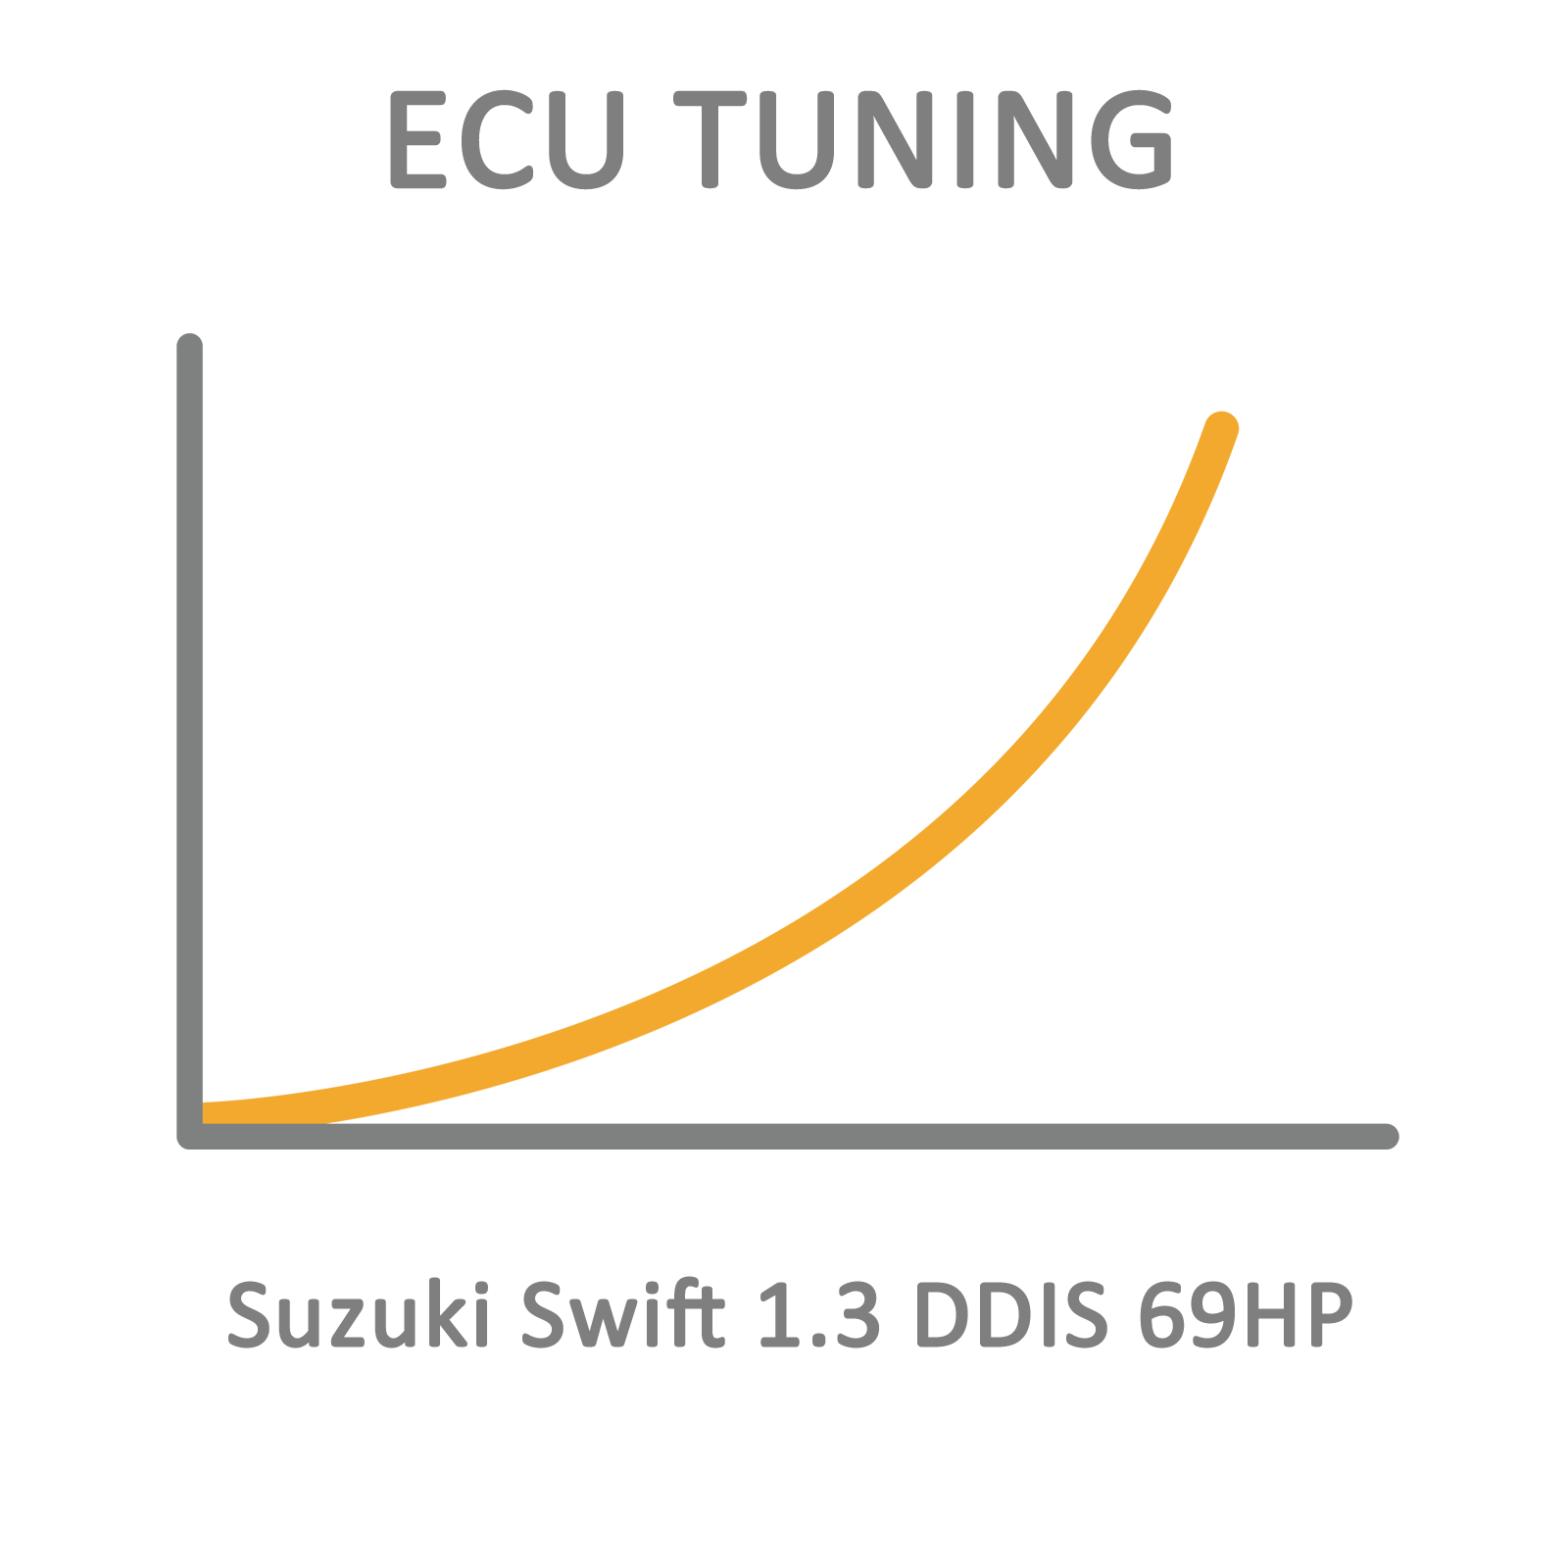 Suzuki Swift 1.3 DDIS 69HP ECU Tuning Remapping Programming